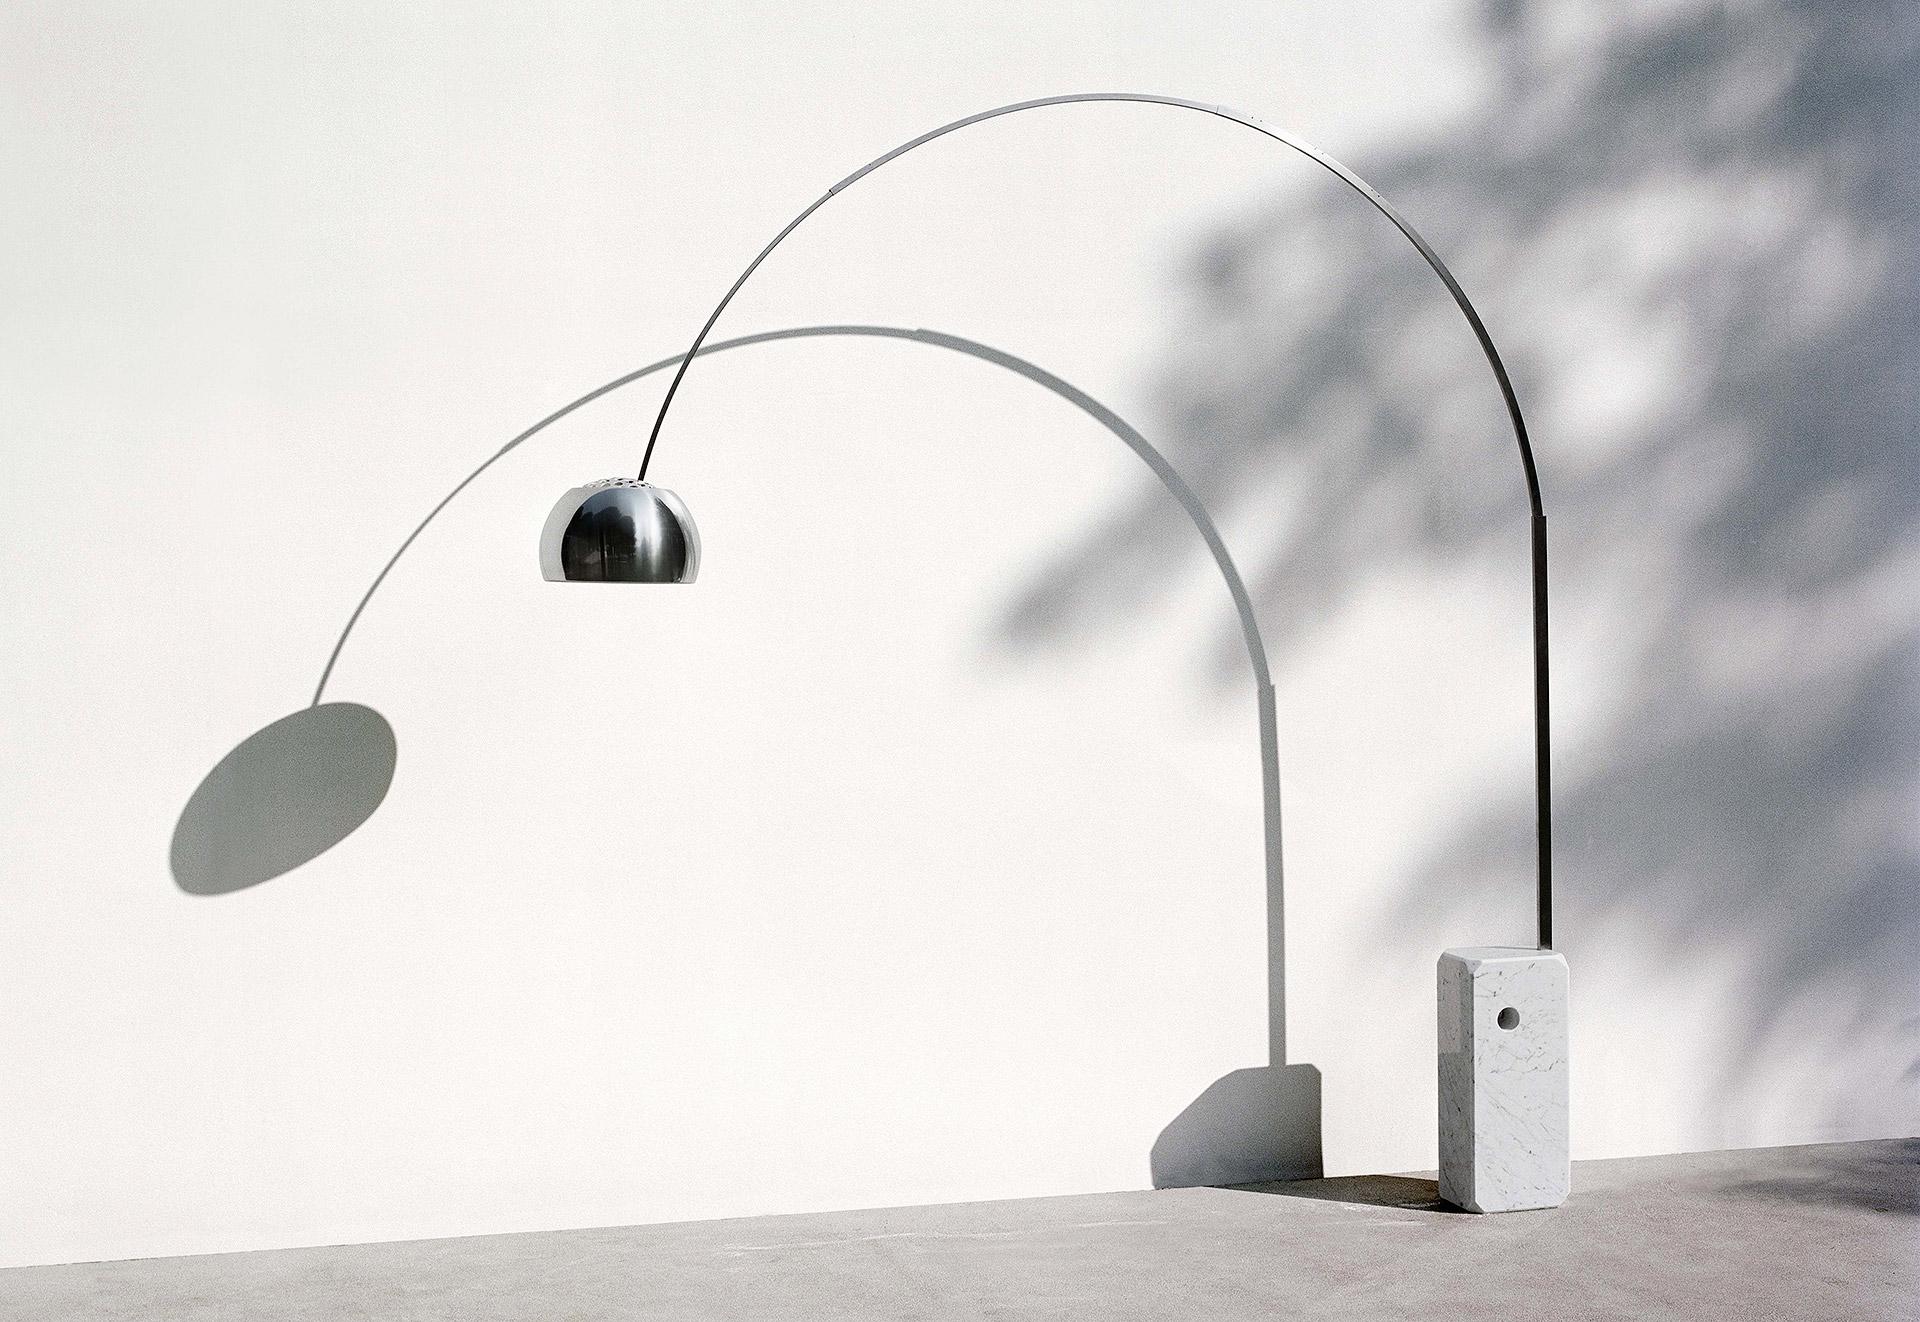 Stojací lampa Flos Arco © Flos